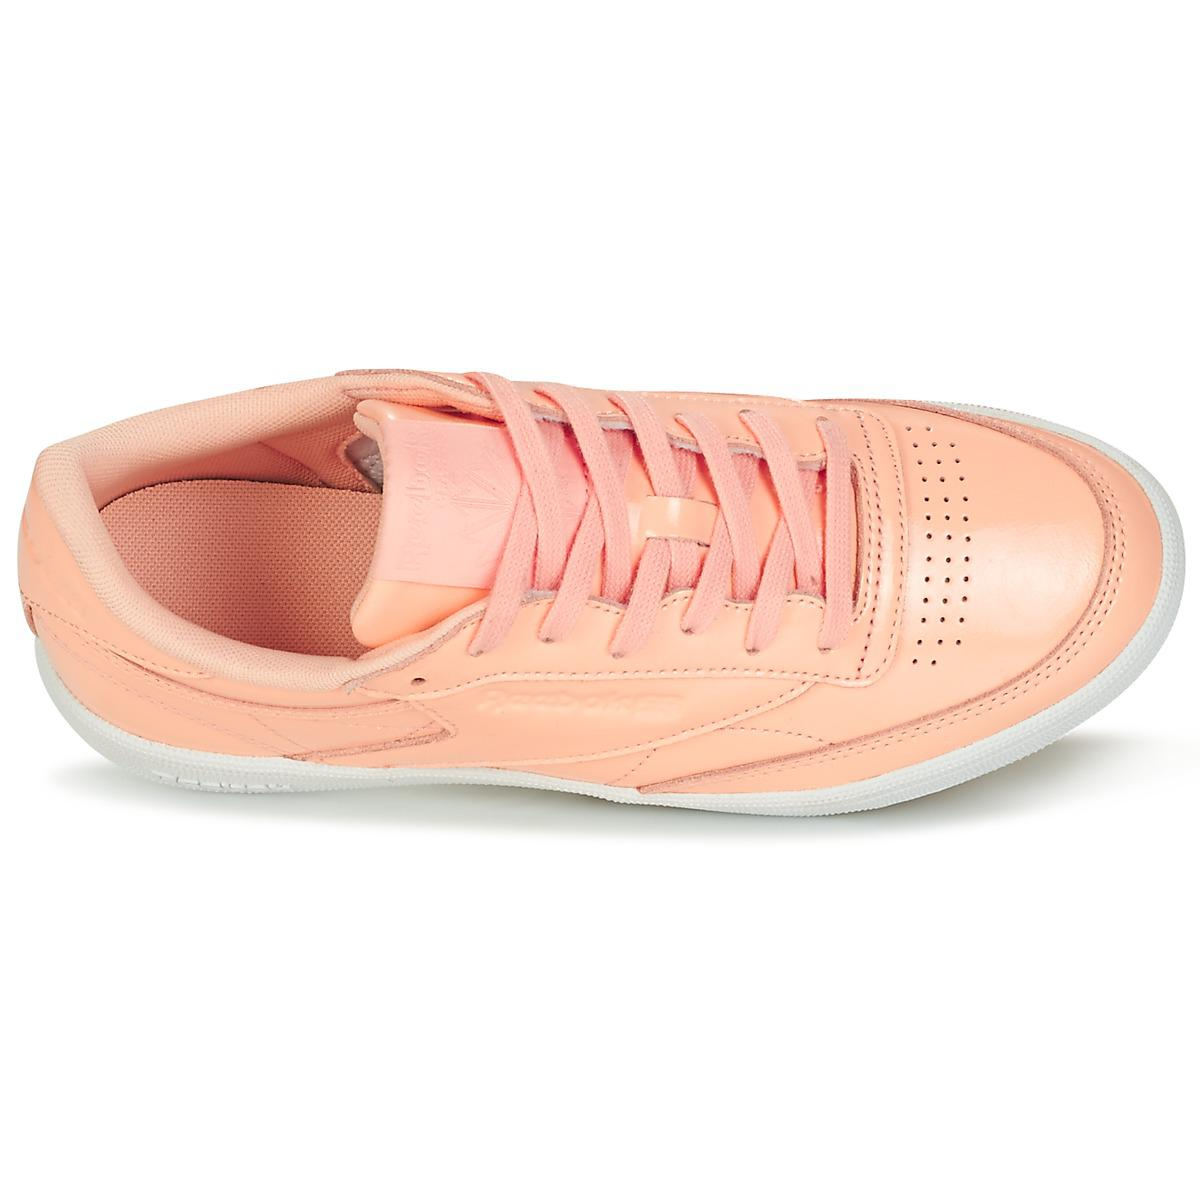 e5dda7b7595 Reebok Club C 85 Patent Shoes (trainers) in Pink - Lyst